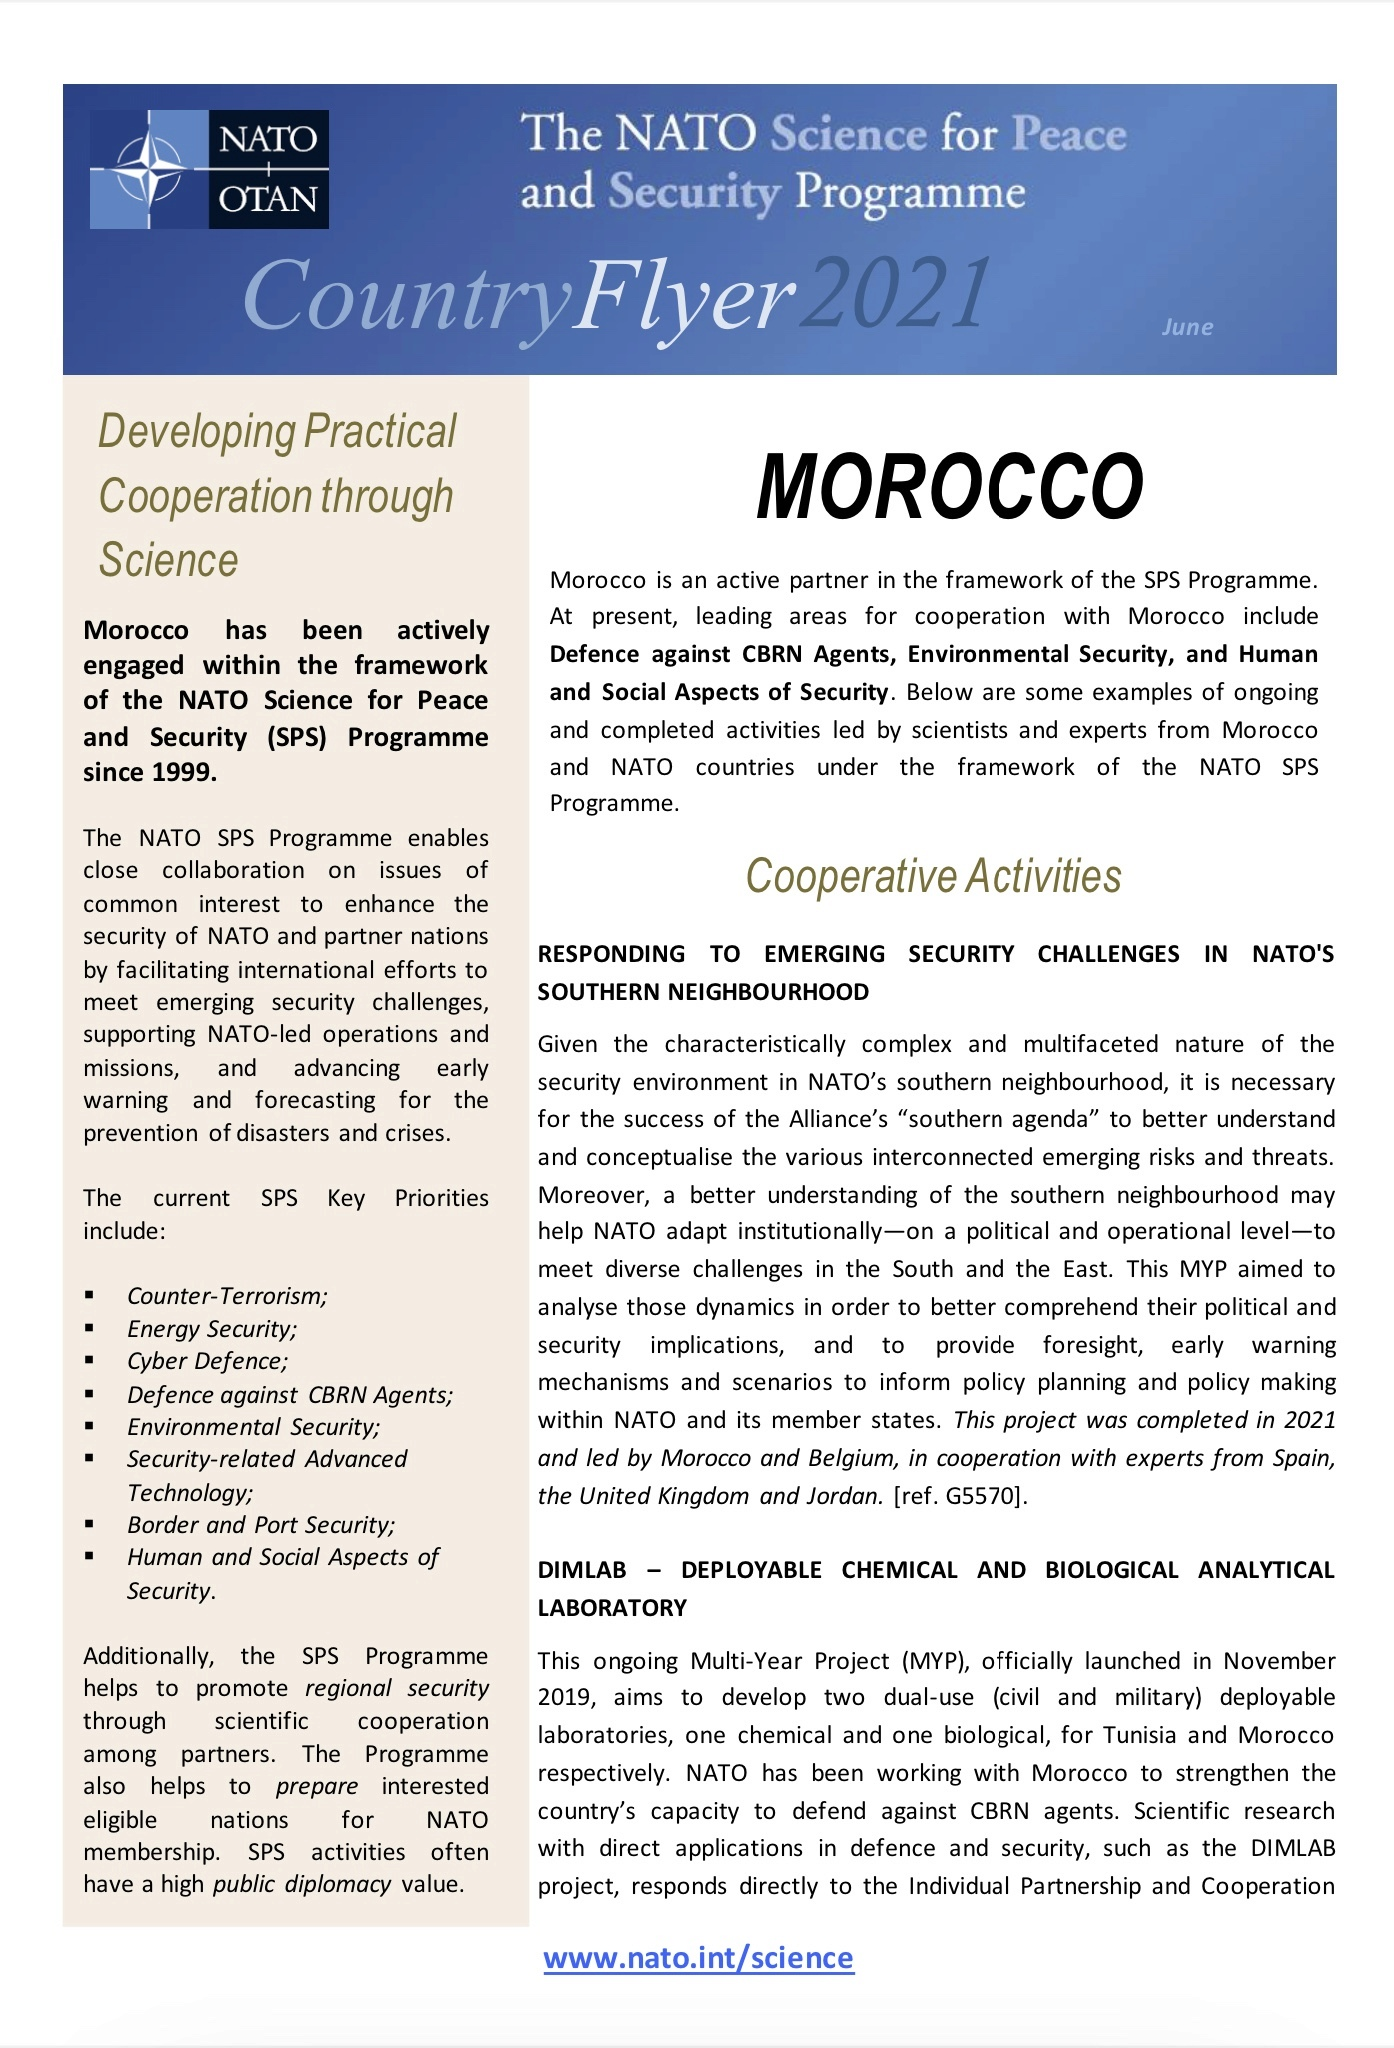 Les relations Maroc - OTAN / Morocco - NATO Cooperation - Page 7 A47d6410